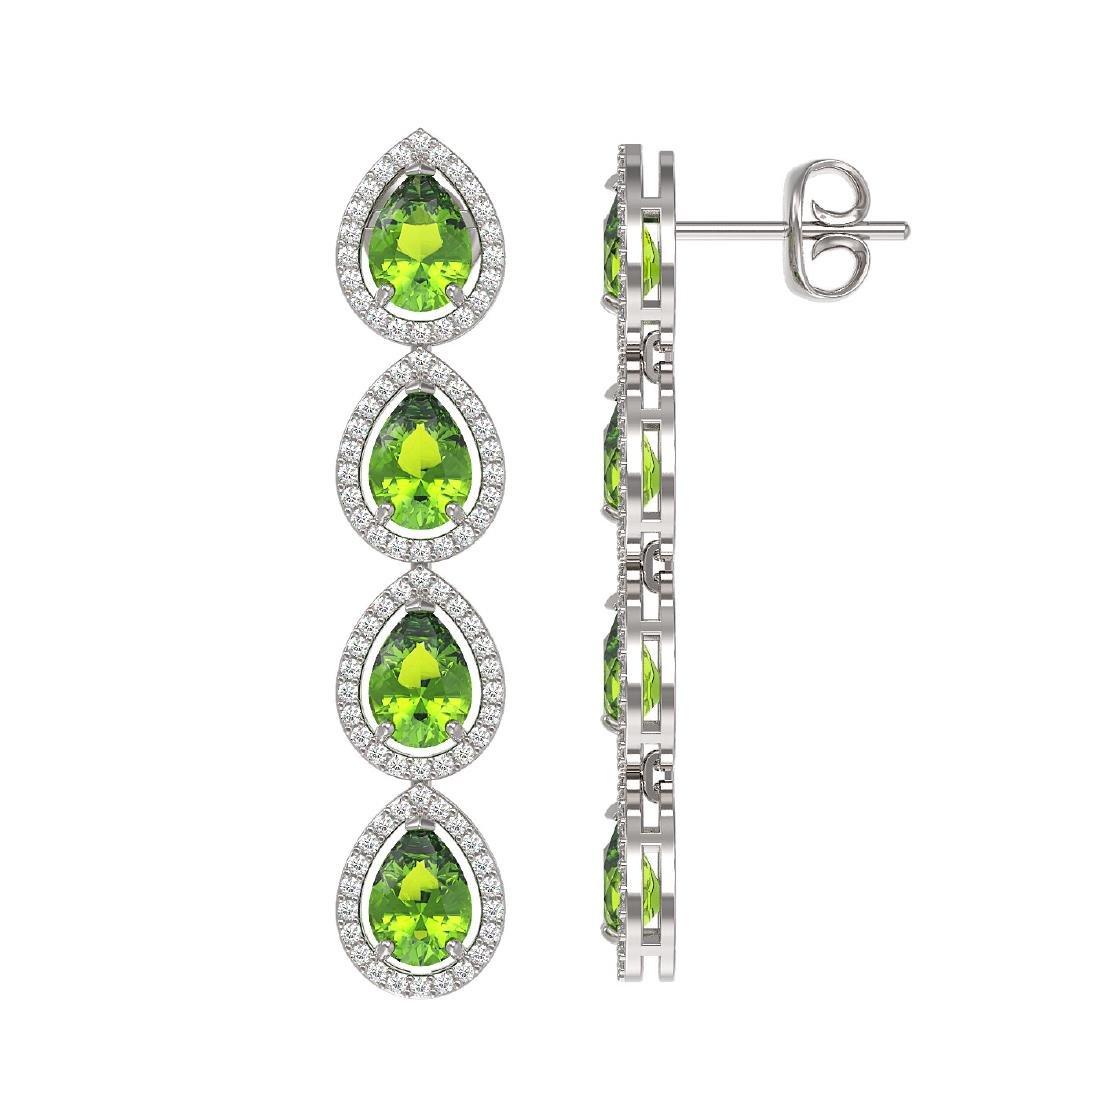 7.46 CTW Peridot & Diamond Halo Earrings 10K White Gold - 2